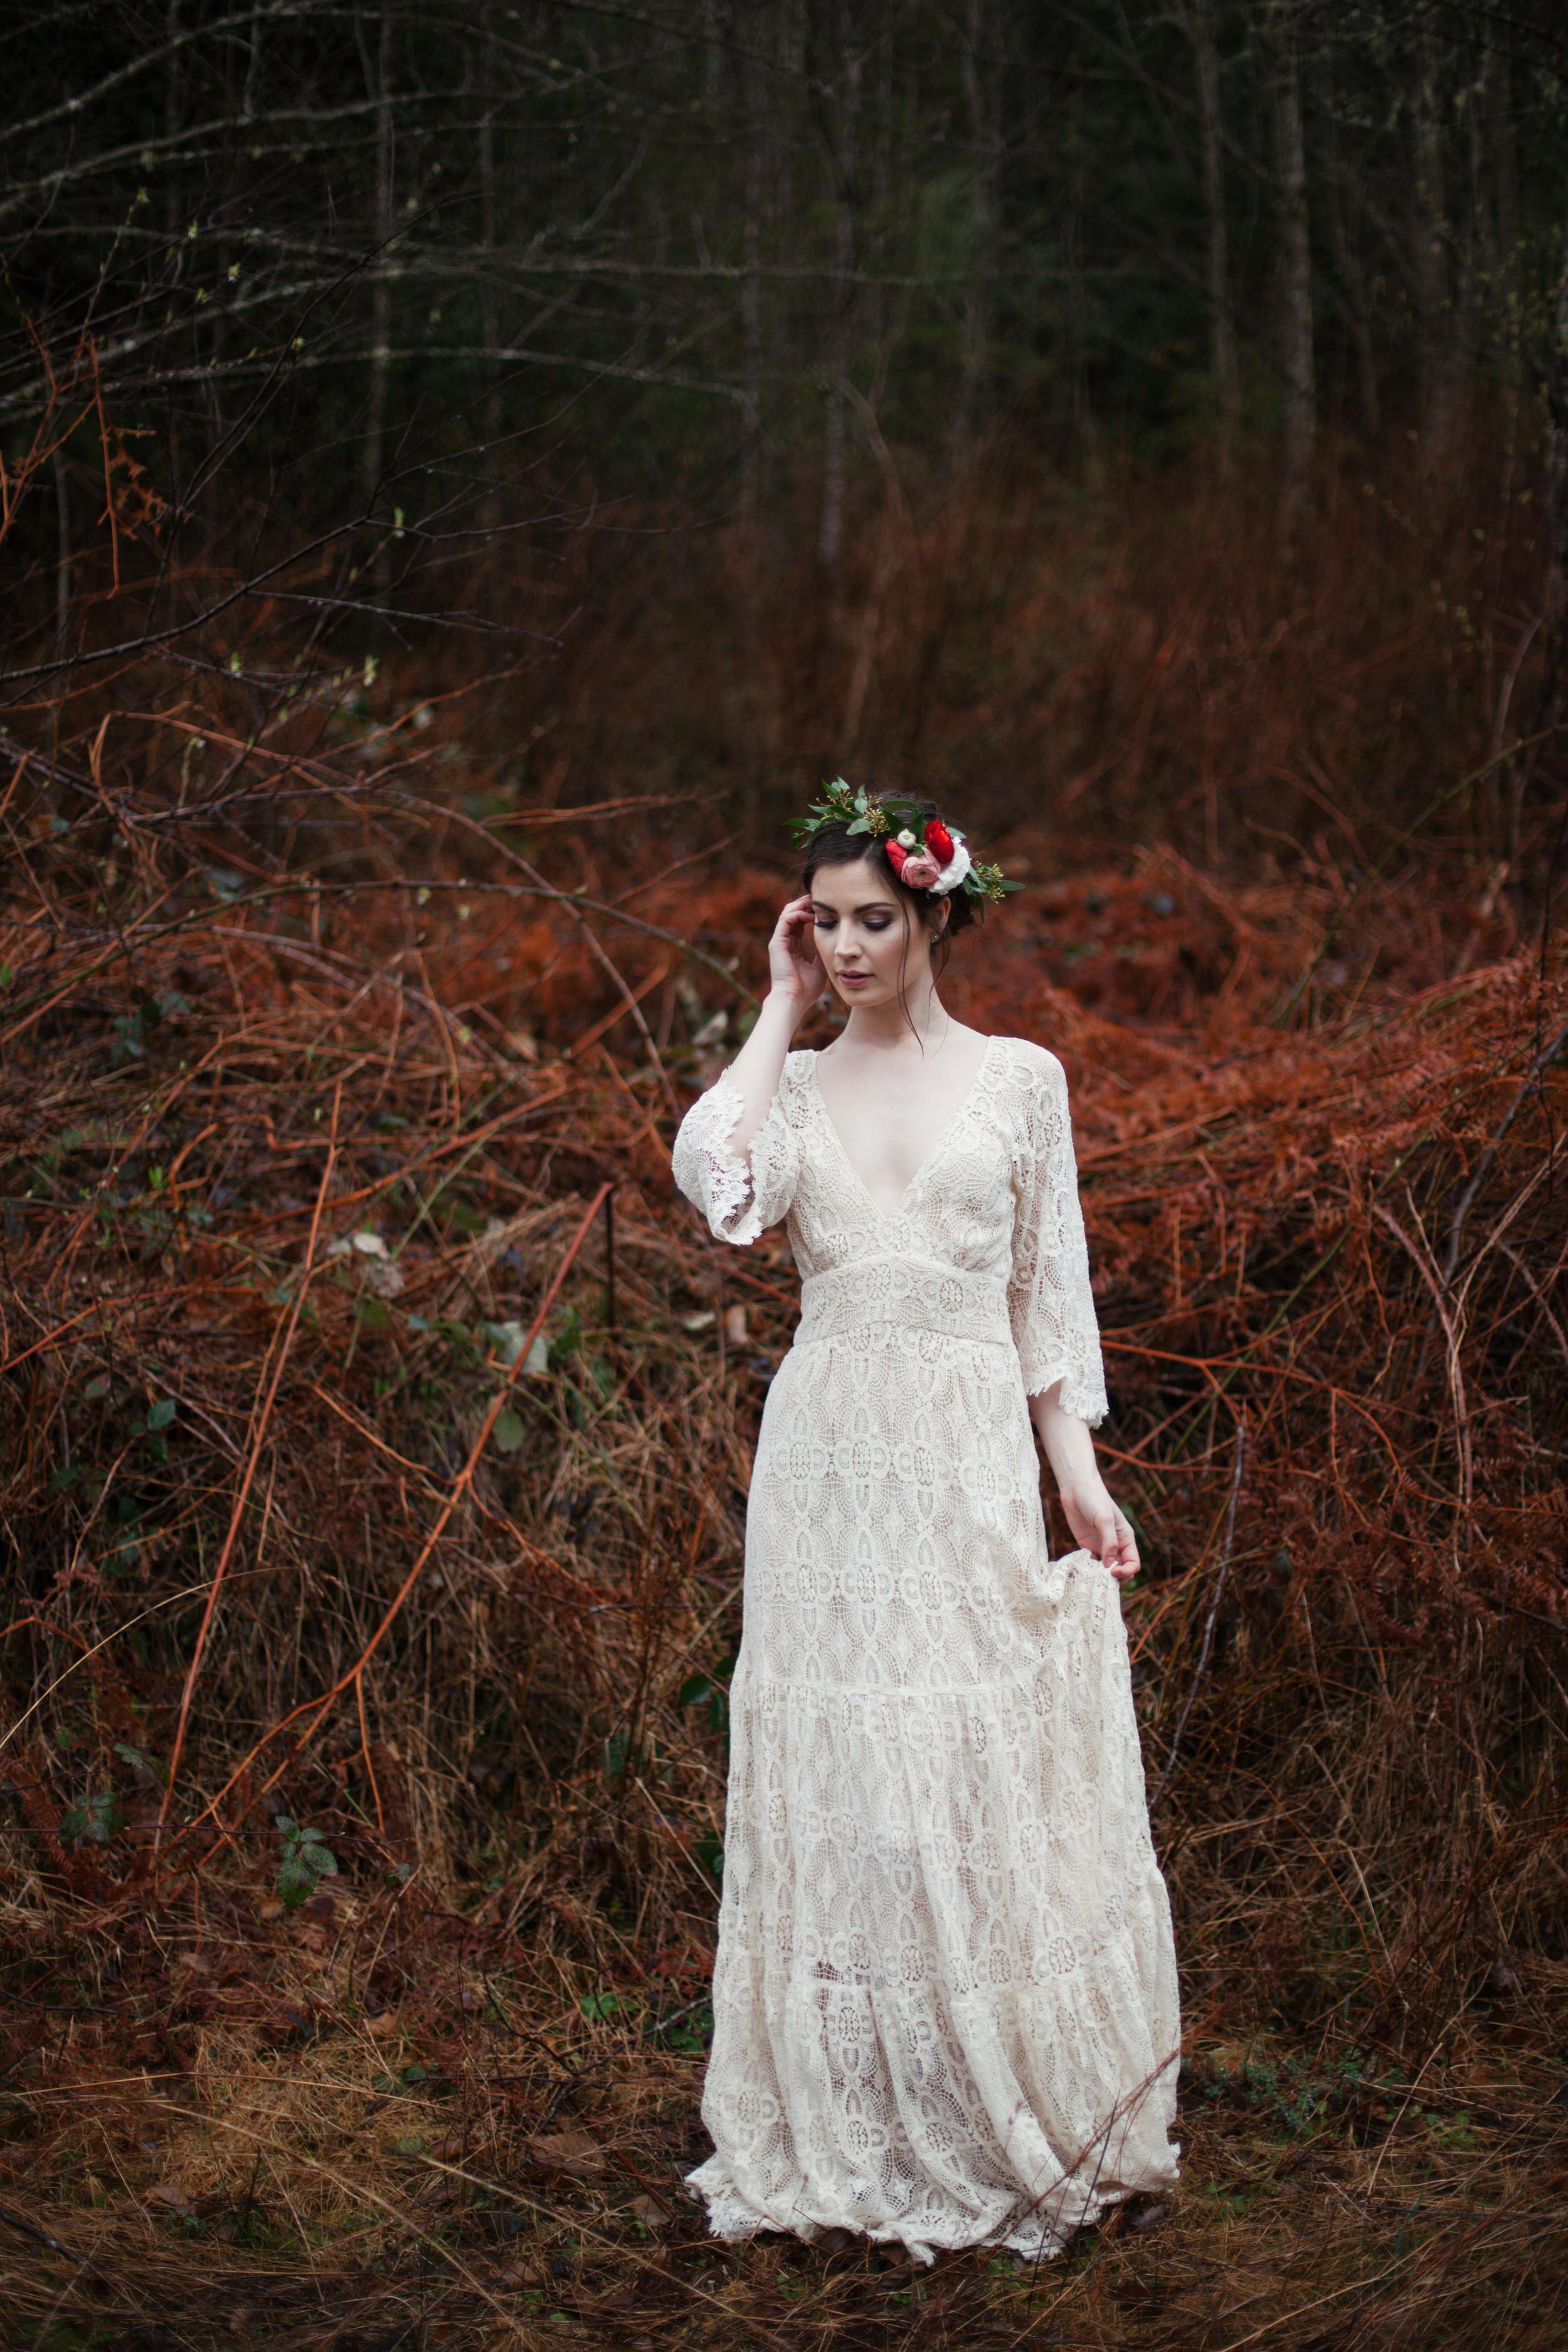 bridal_shoot_ (26 of 60).jpg